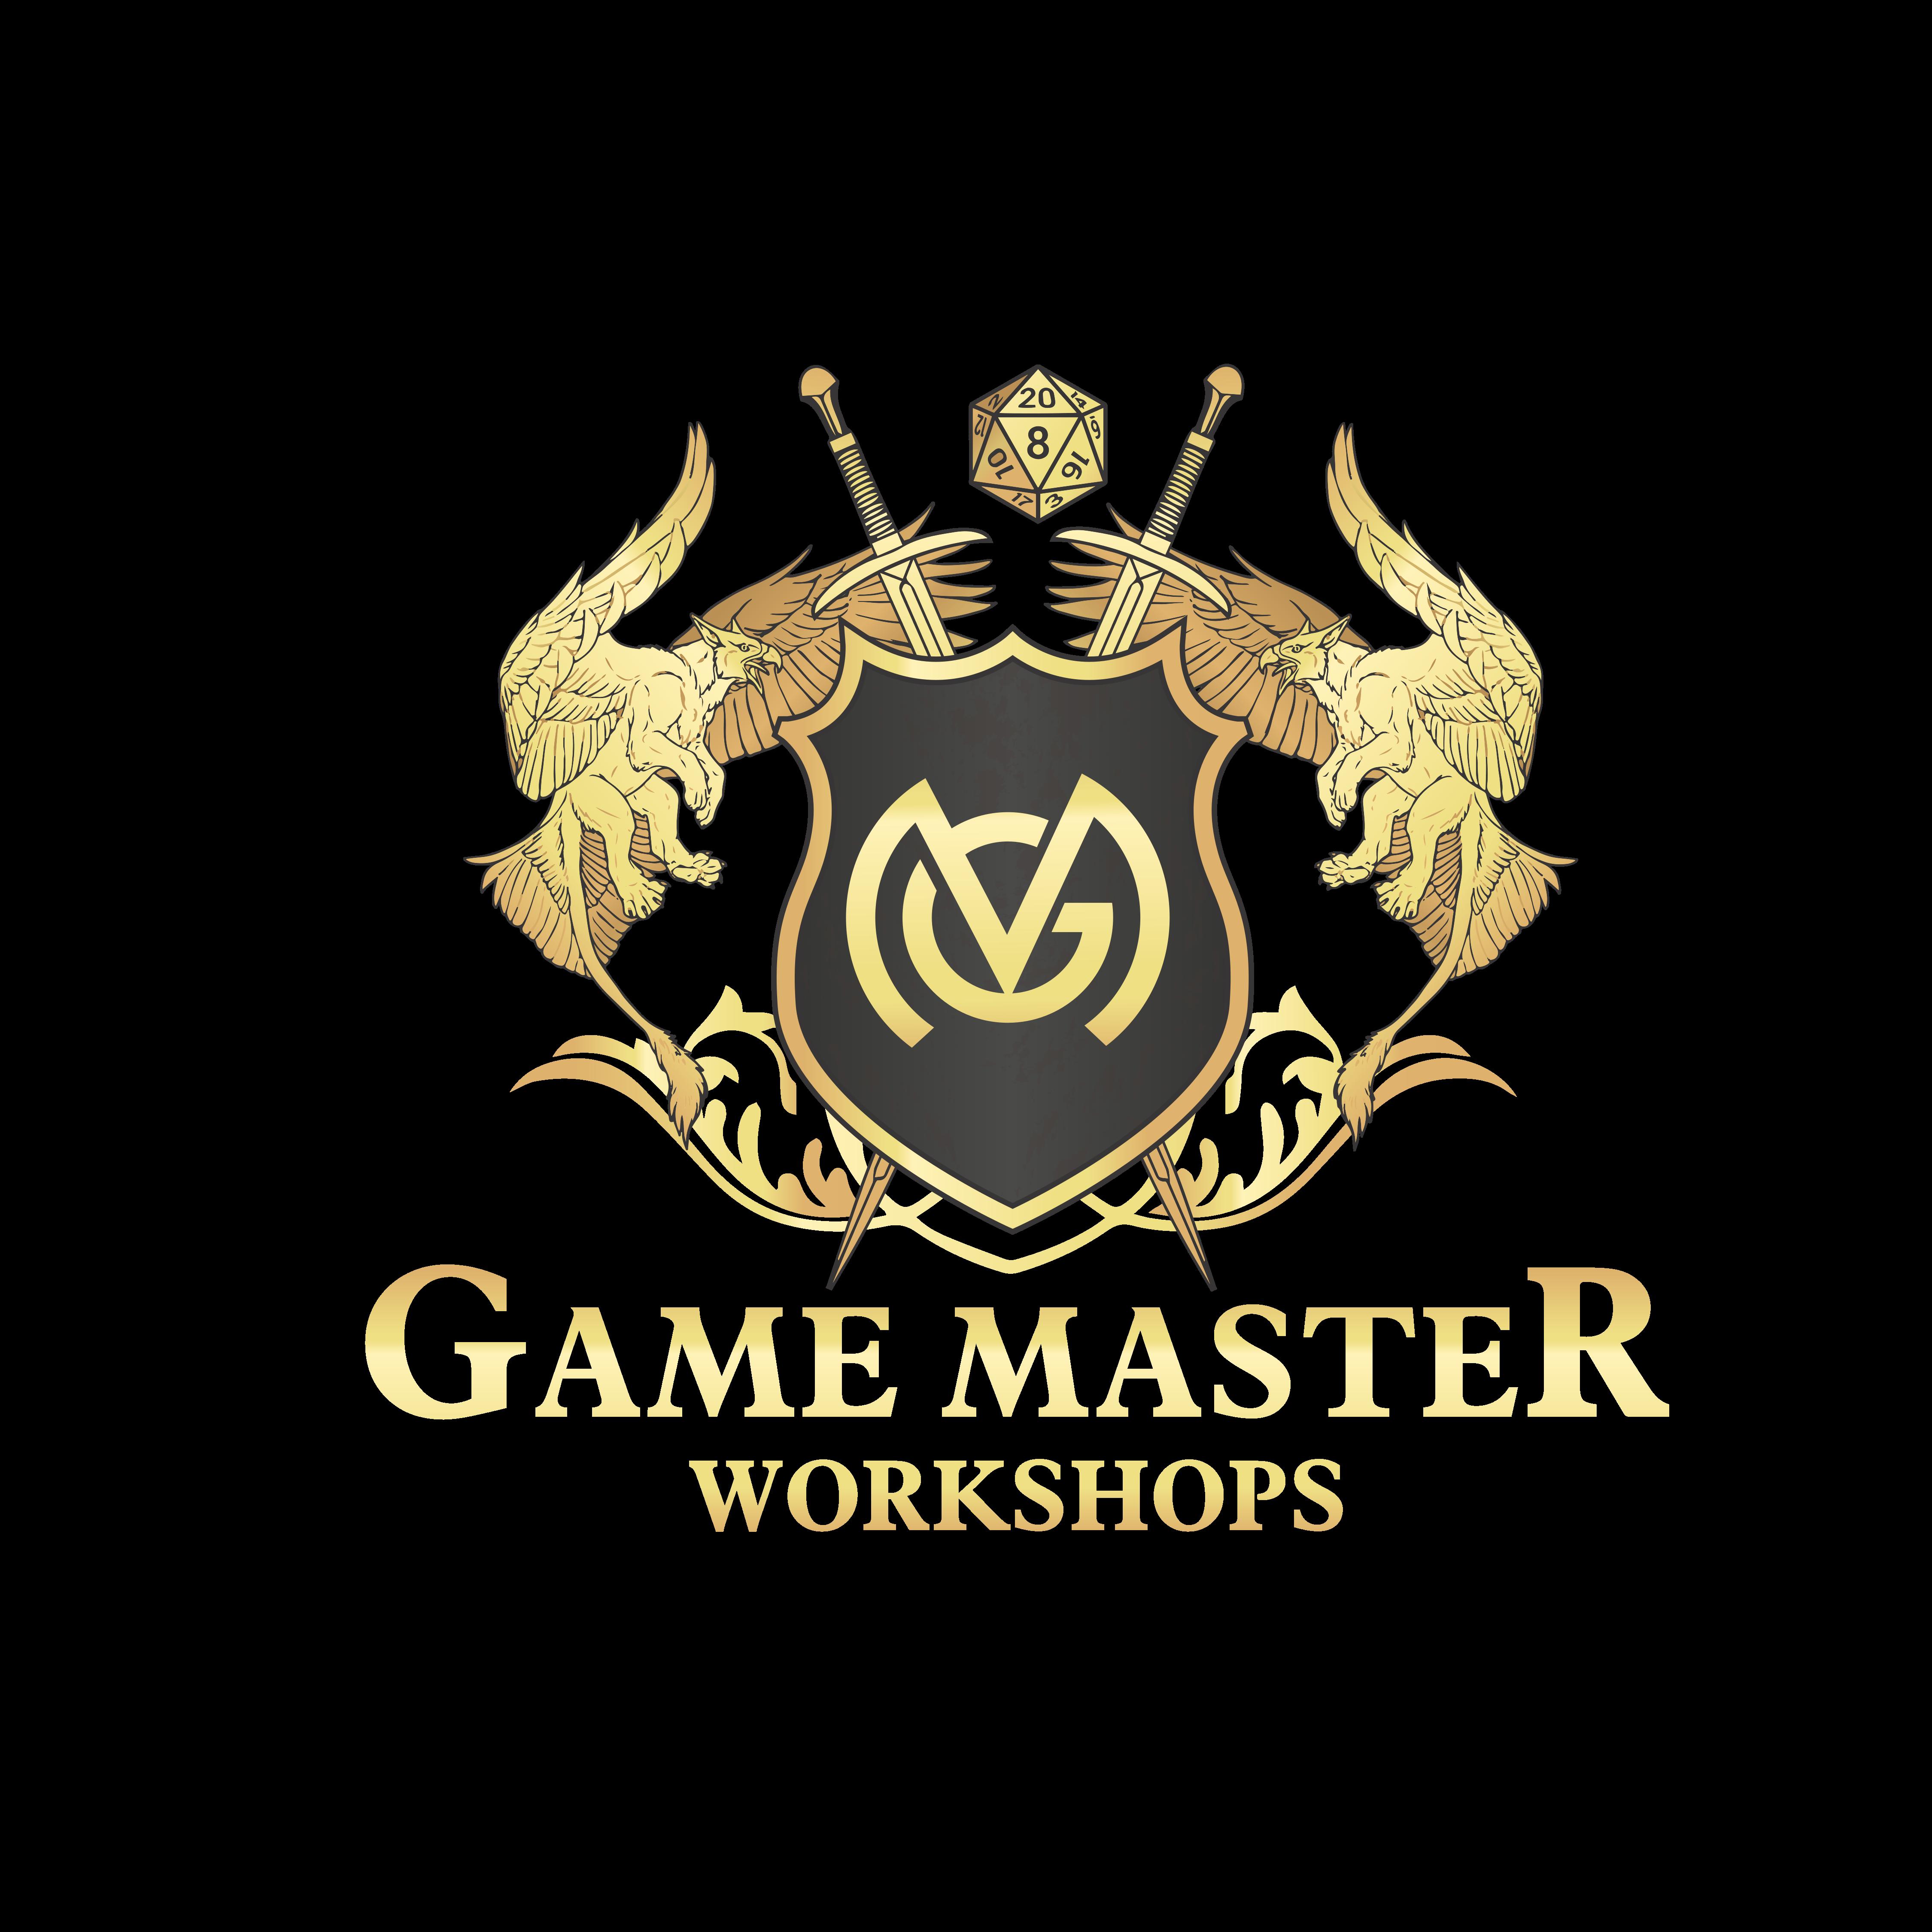 gmworkshops-logo-whitebg2-4500sq300d.png